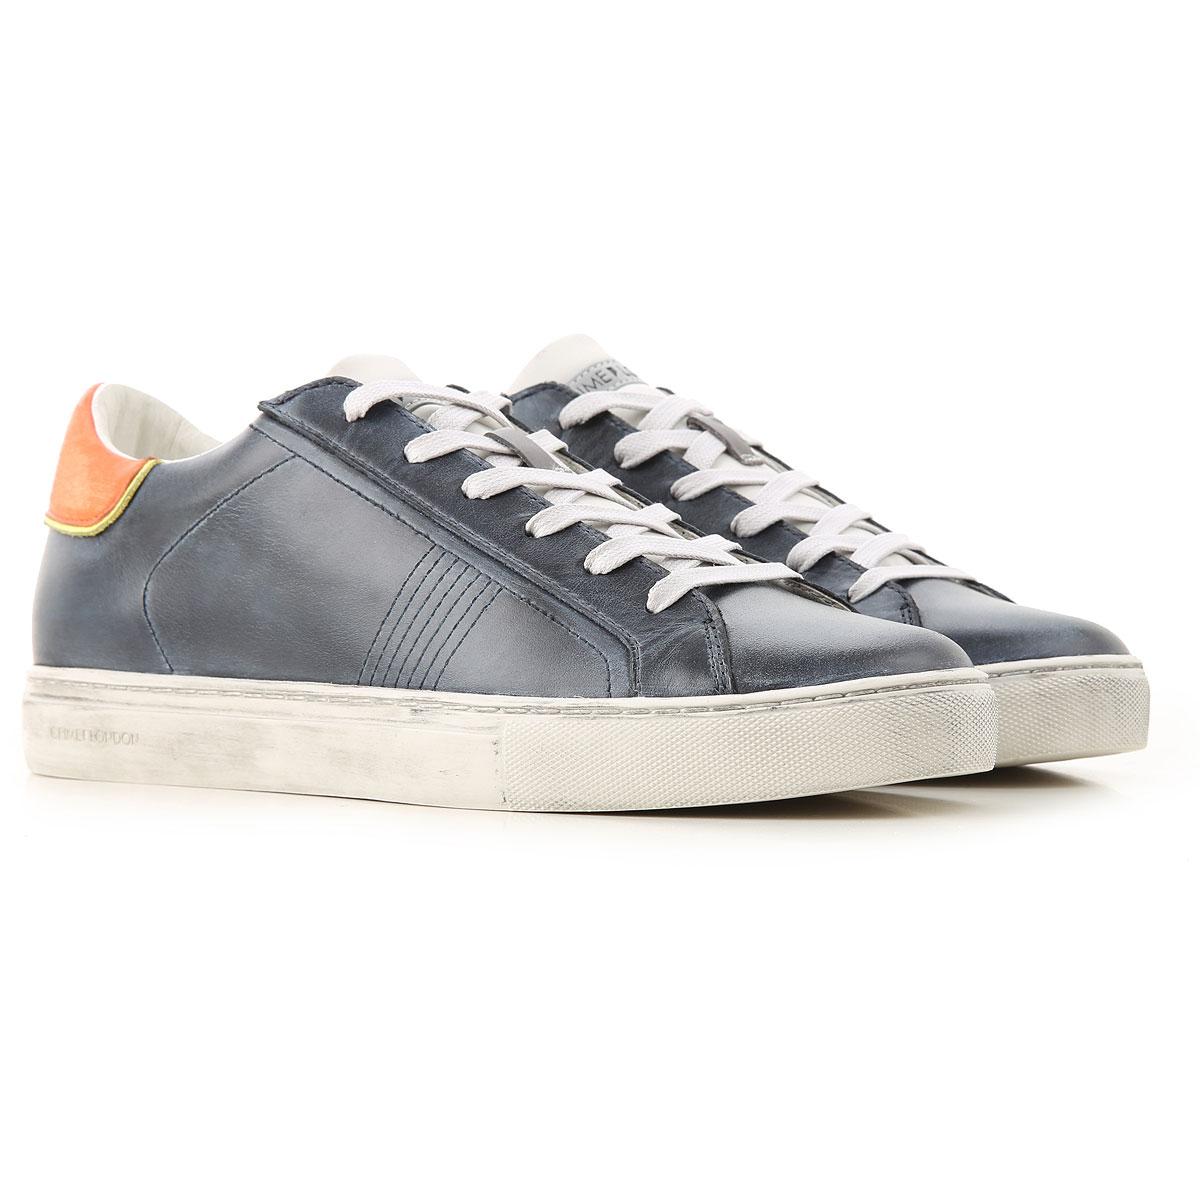 Crime Sneakers for Men On Sale, Blu Denim, Leather, 2019, 11.5 7.5 8 9